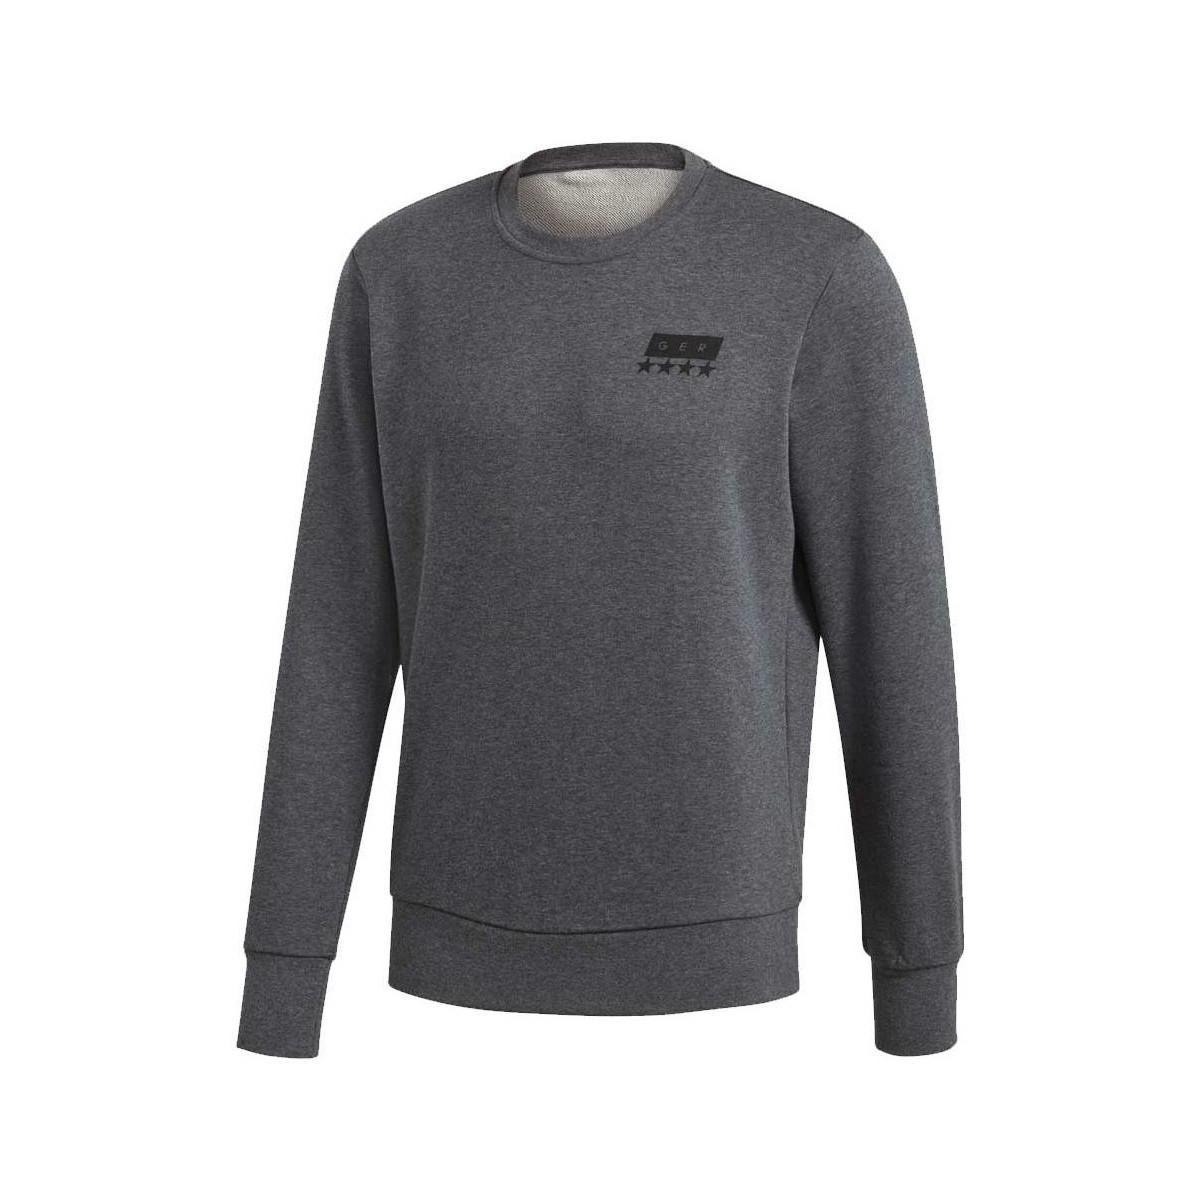 205b1333d adidas 2018-2019 Germany Graphic Crew Sweatshirt Women's Sweatshirt ...